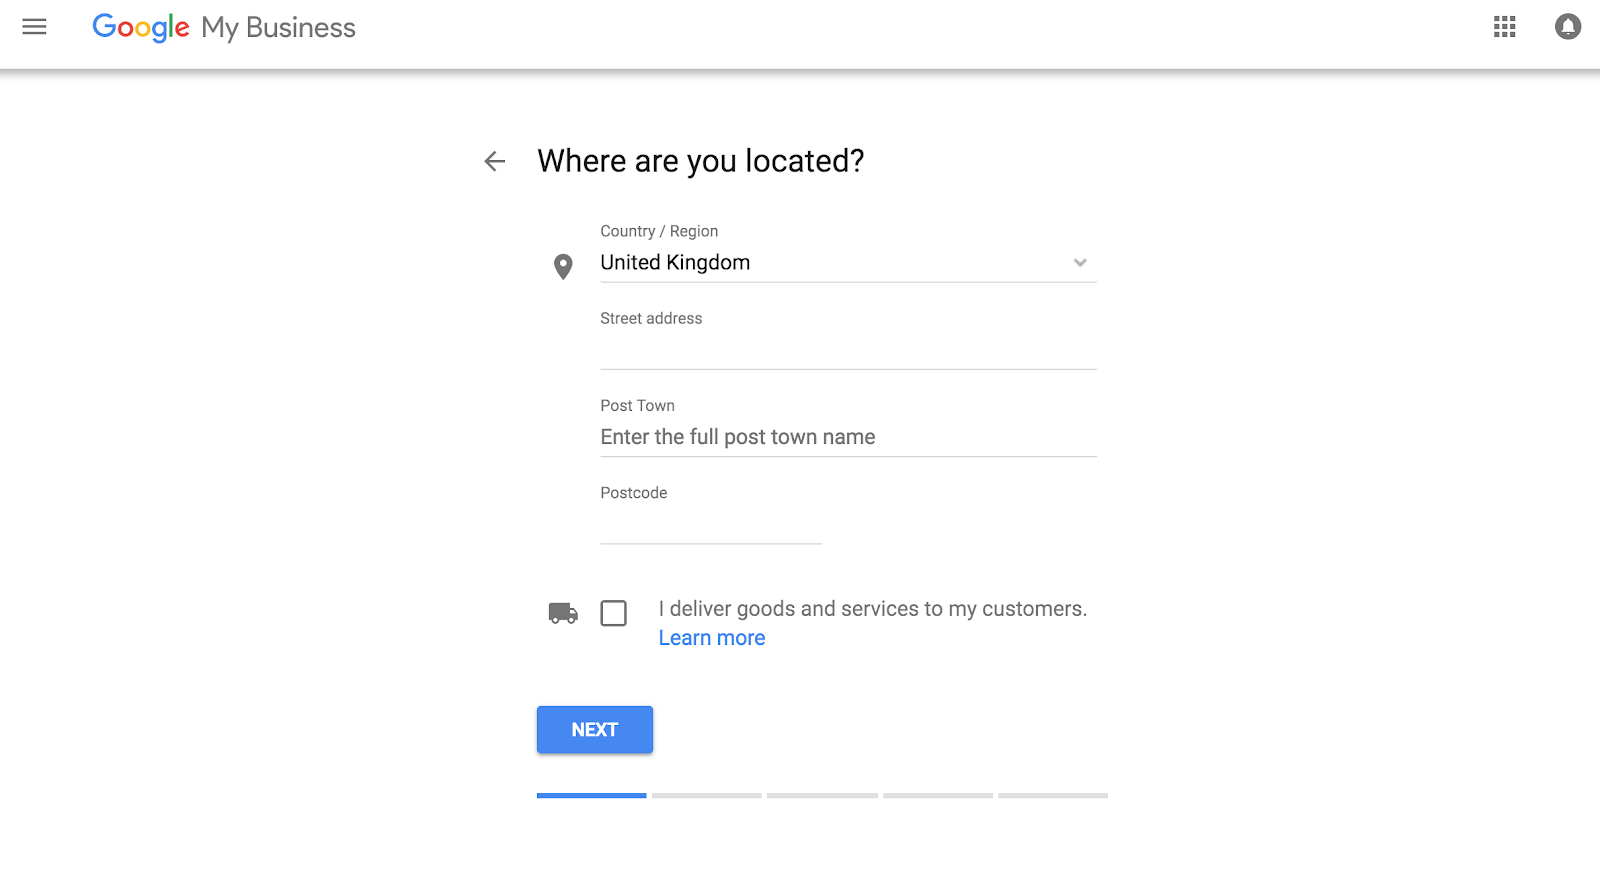 Google My Business - Location